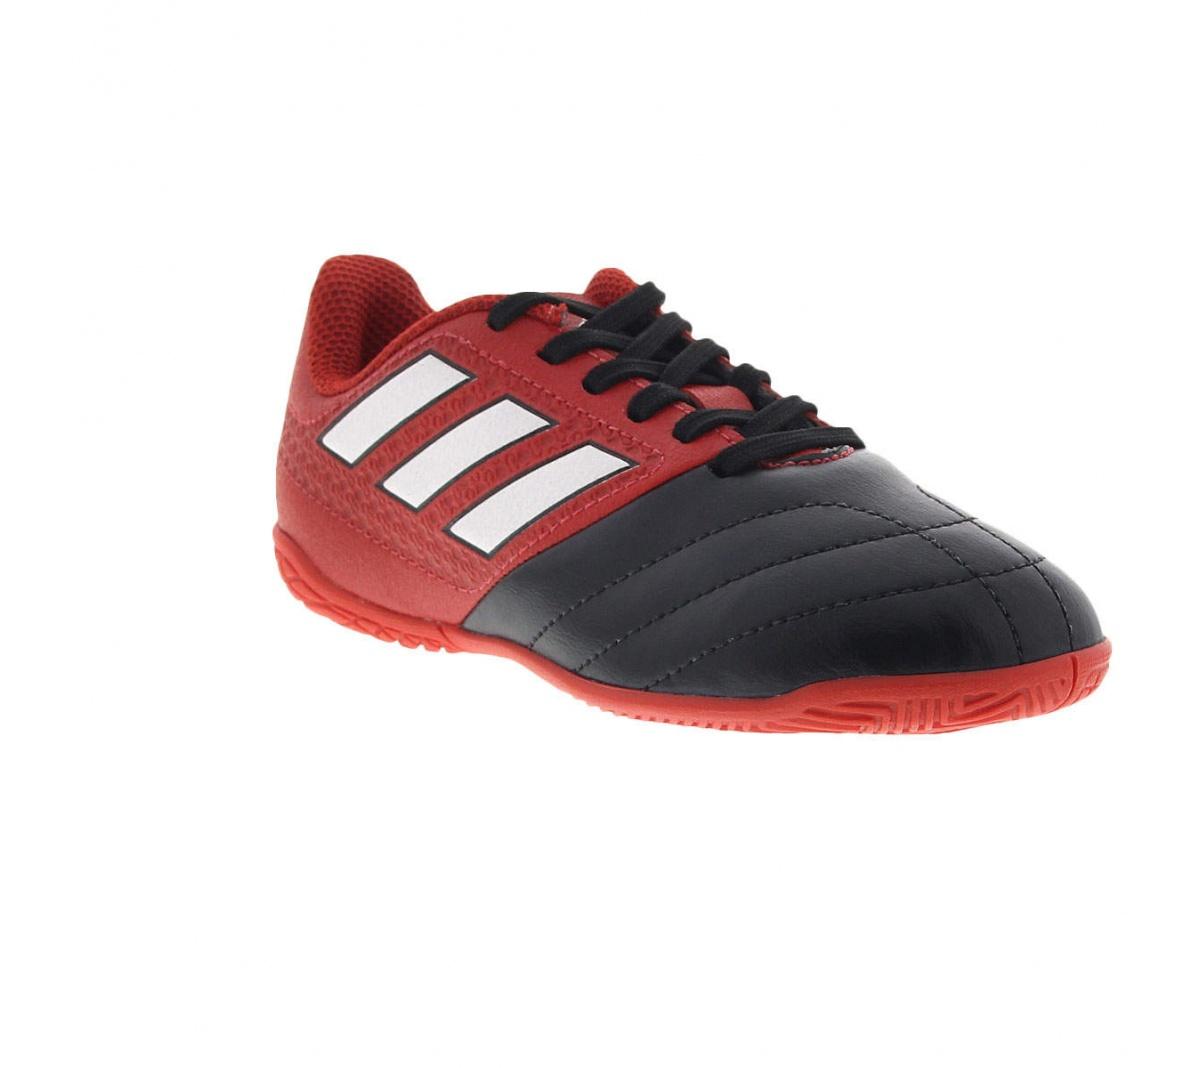 Tênis Adidas Ace 17.4 Futsal Infantil